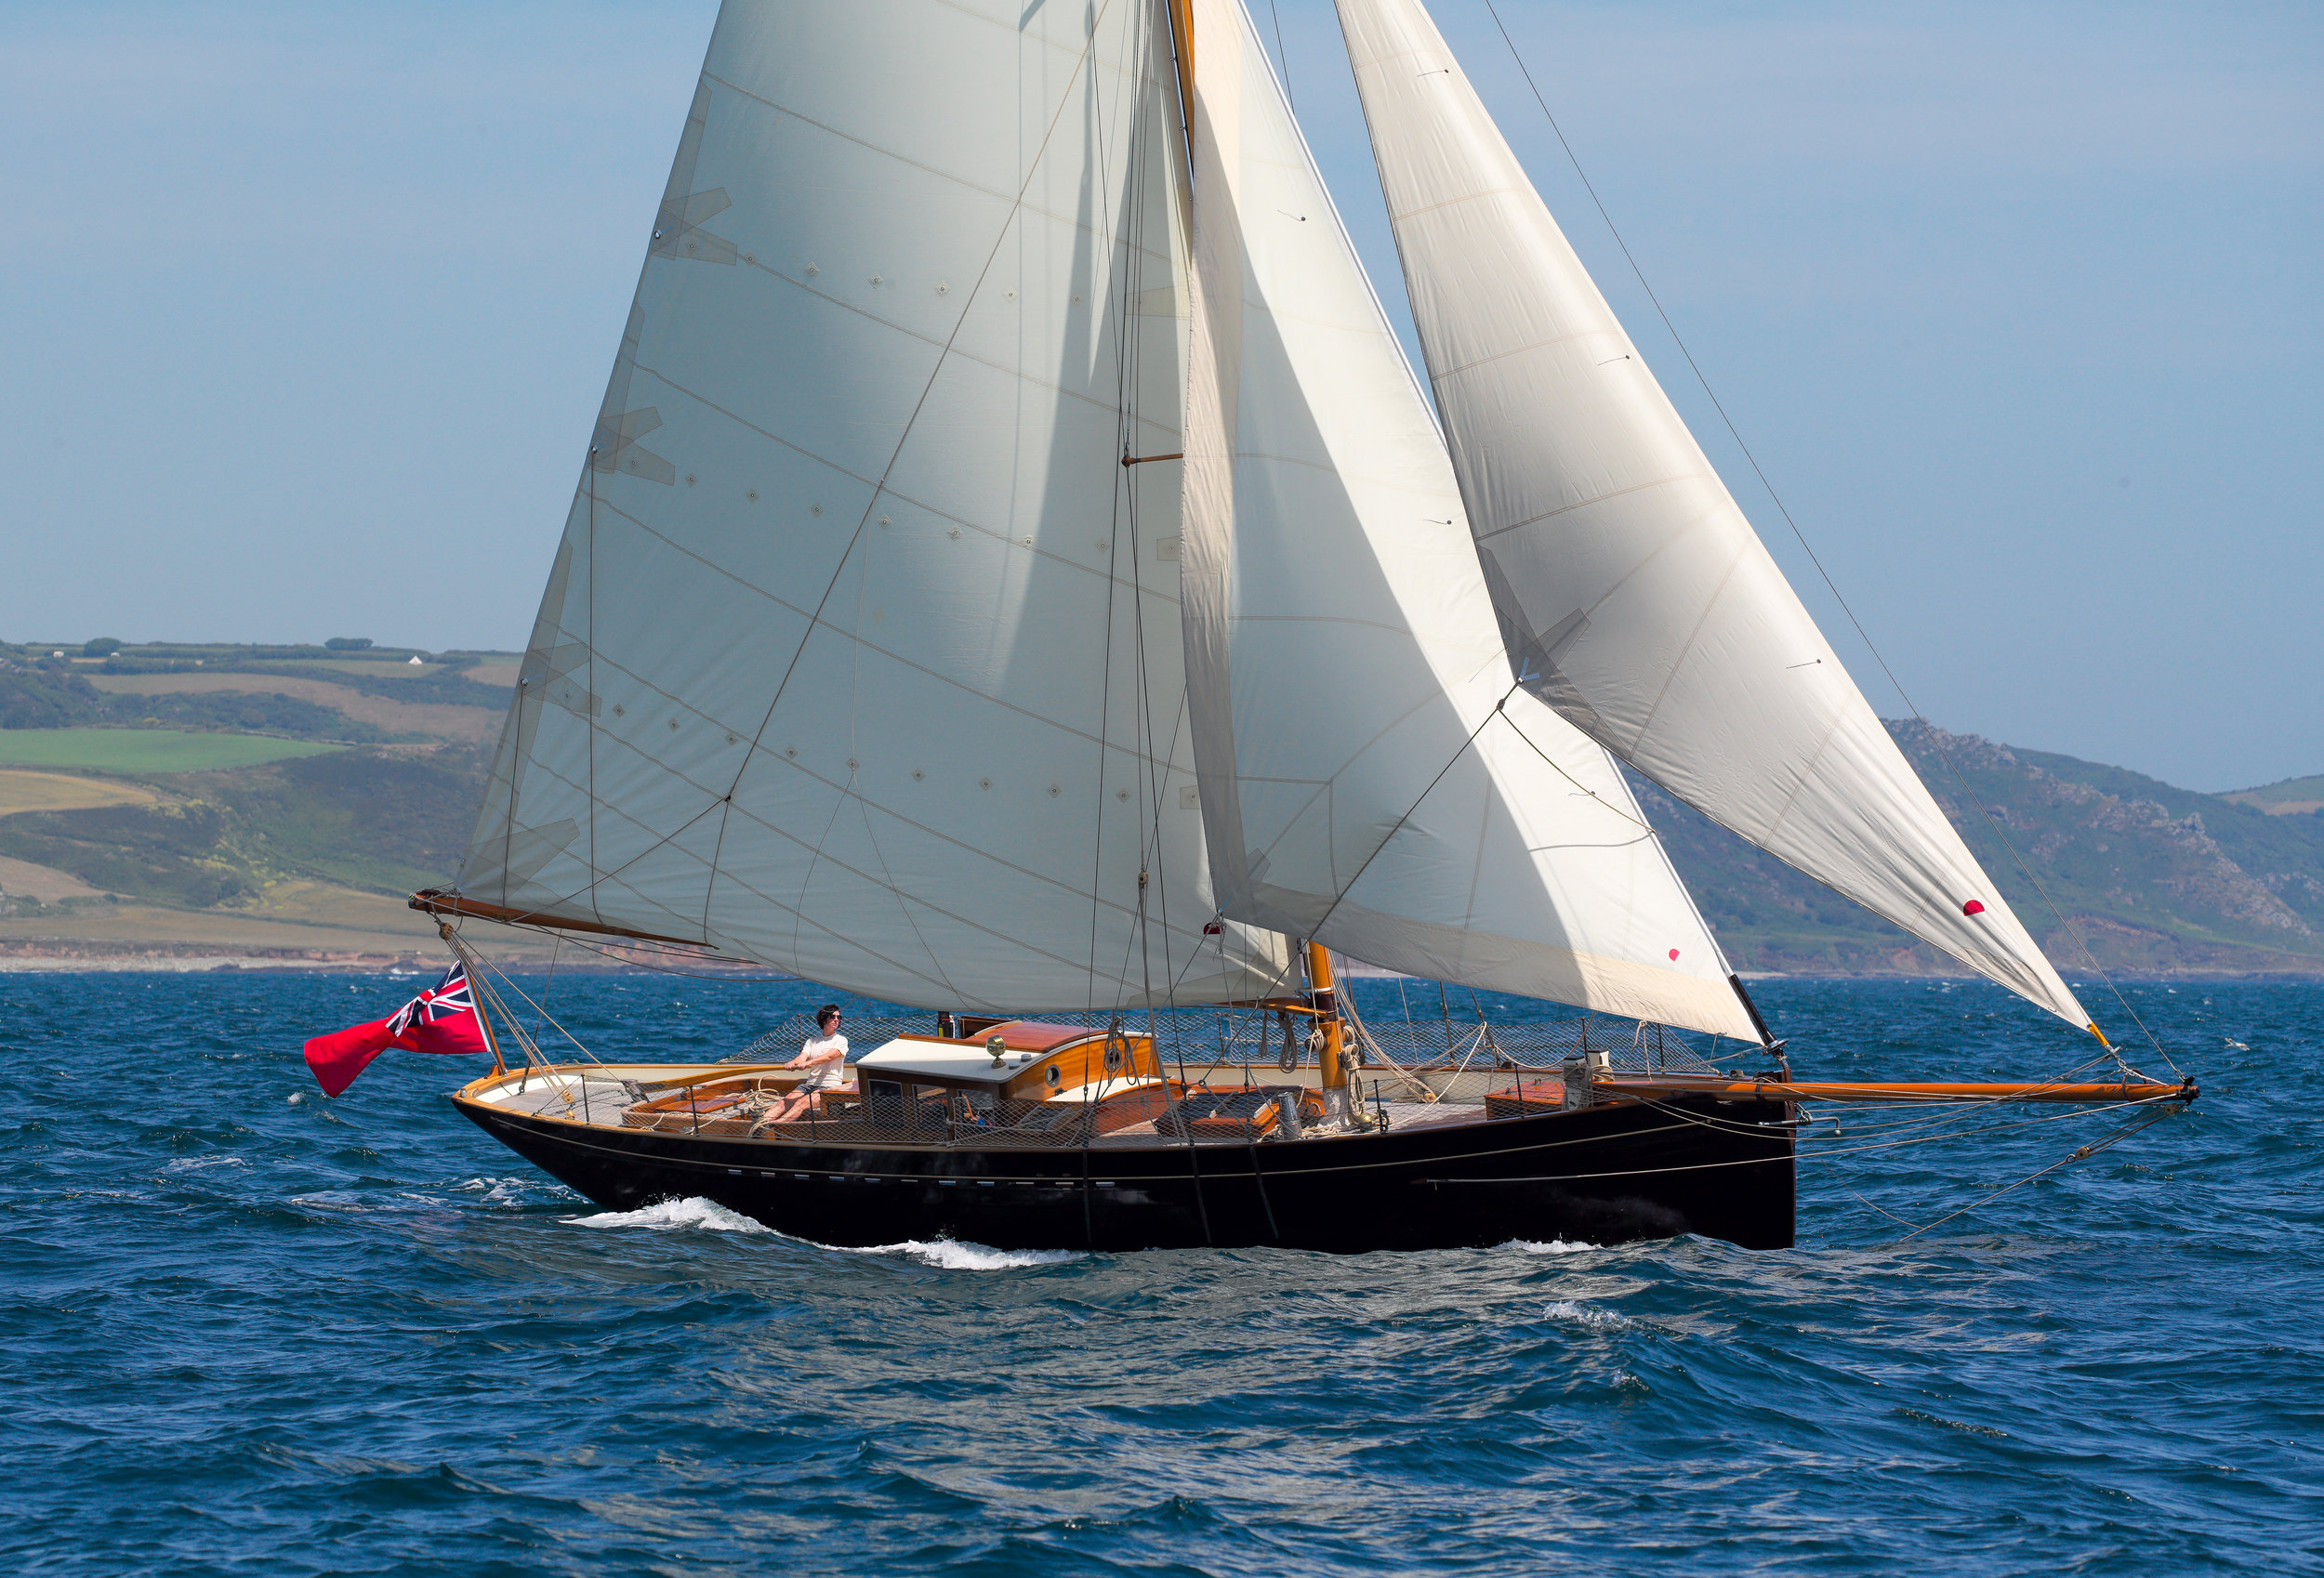 "'Bonaventure of Salcombe' under sail. Her powerful rig and sleek, seaworthy hull make cruising a comfortable and enjoyable experience                     Normal   0           false   false   false     EN-US   JA   X-NONE                                                                                                                                                                                                                                                                                                                                                                              /* Style Definitions */ table.MsoNormalTable {mso-style-name:""Table Normal""; mso-tstyle-rowband-size:0; mso-tstyle-colband-size:0; mso-style-noshow:yes; mso-style-priority:99; mso-style-parent:""""; mso-padding-alt:0cm 5.4pt 0cm 5.4pt; mso-para-margin:0cm; mso-para-margin-bottom:.0001pt; mso-pagination:widow-orphan; font-size:12.0pt; font-family:Cambria; mso-ascii-font-family:Cambria; mso-ascii-theme-font:minor-latin; mso-hansi-font-family:Cambria; mso-hansi-theme-font:minor-latin; mso-ansi-language:EN-US;}     © Mark Lloyd"